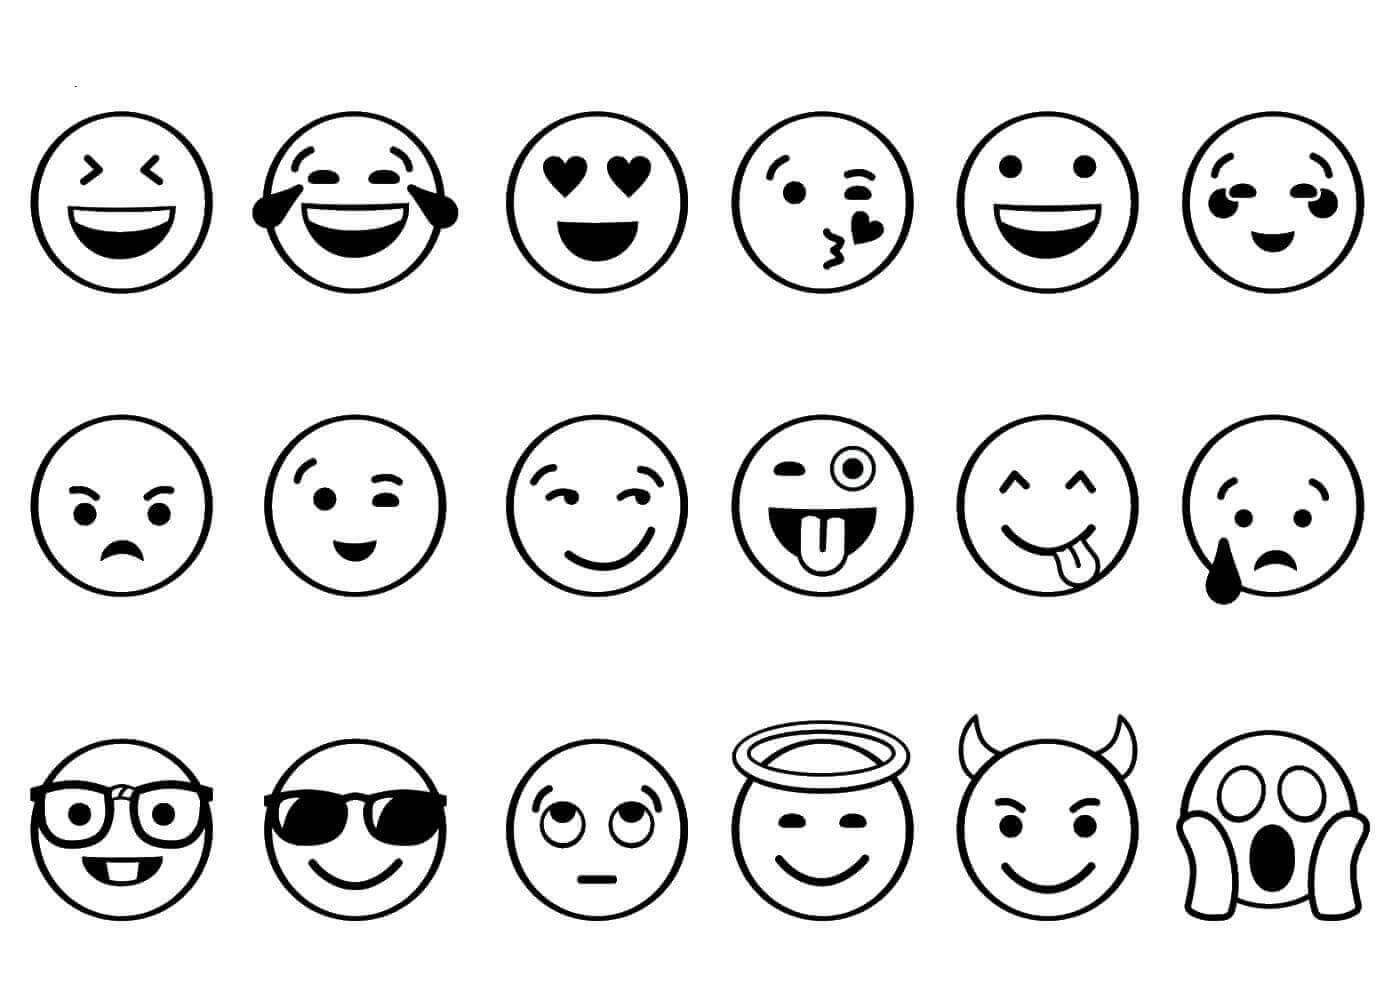 Printable Emoji Coloring Sheets  Free Printable Emoji Coloring Pages